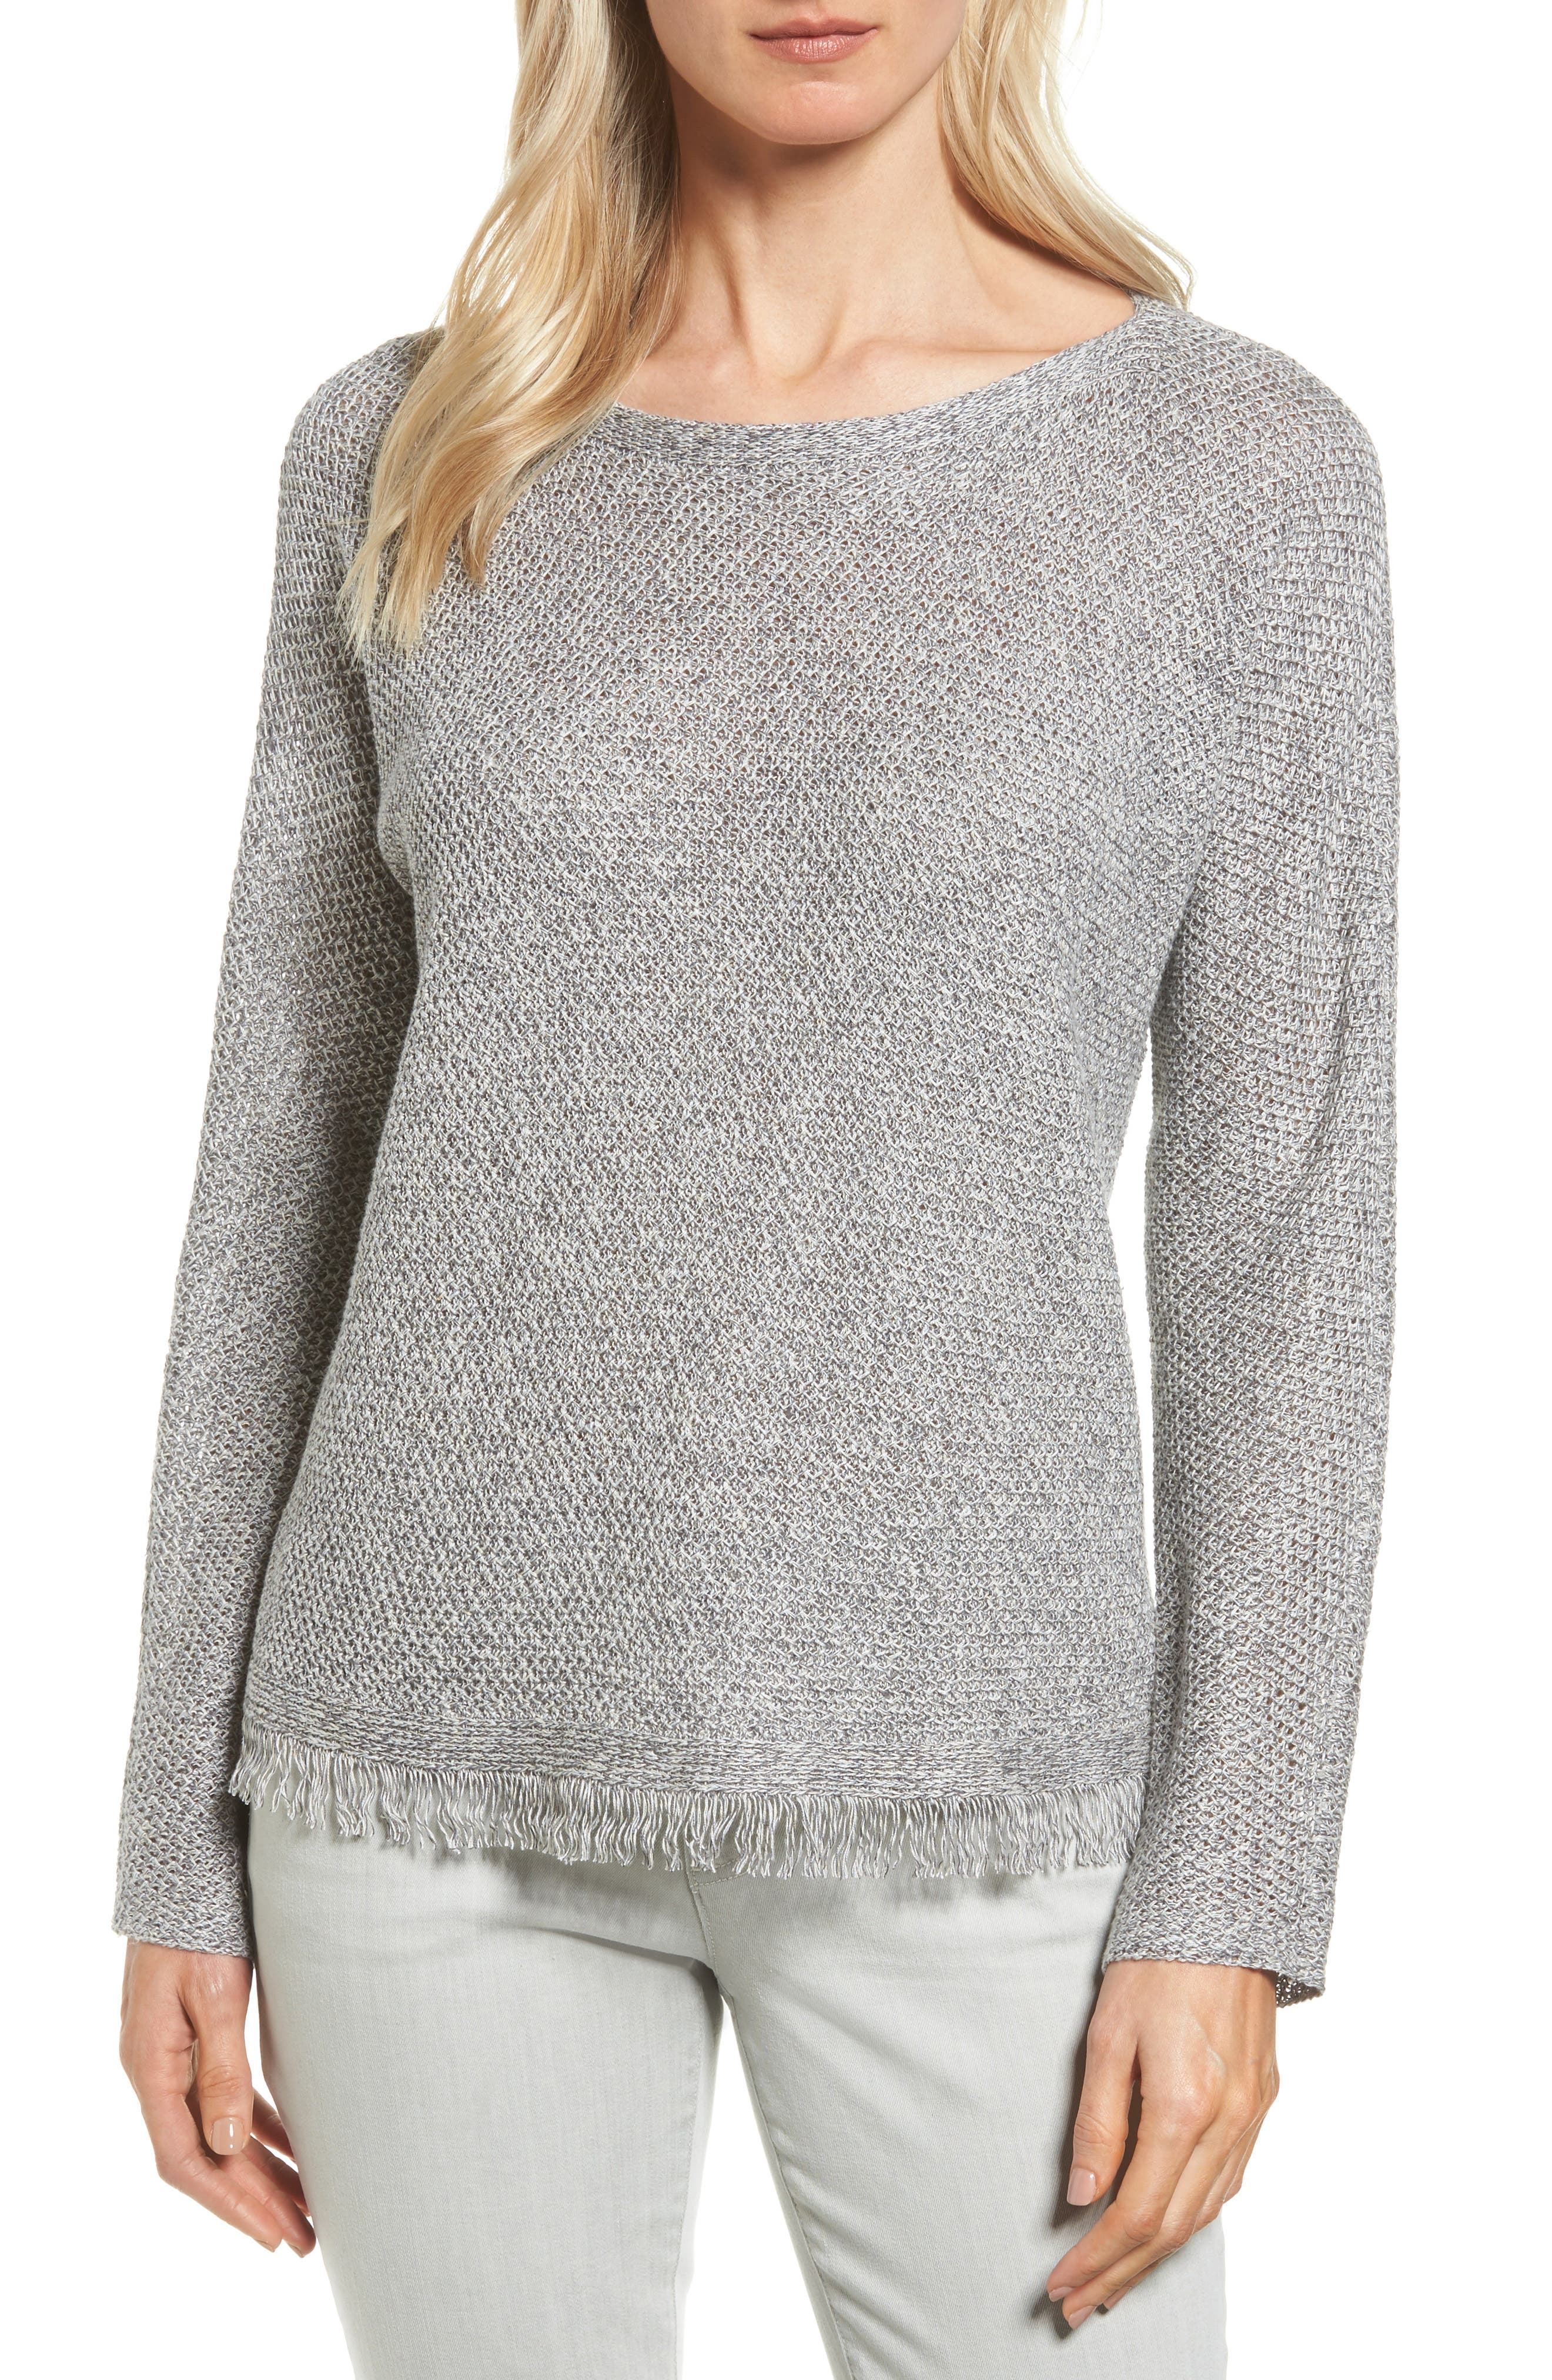 Eileen Fisher Organic Linen Pullover (Regular & Petite)